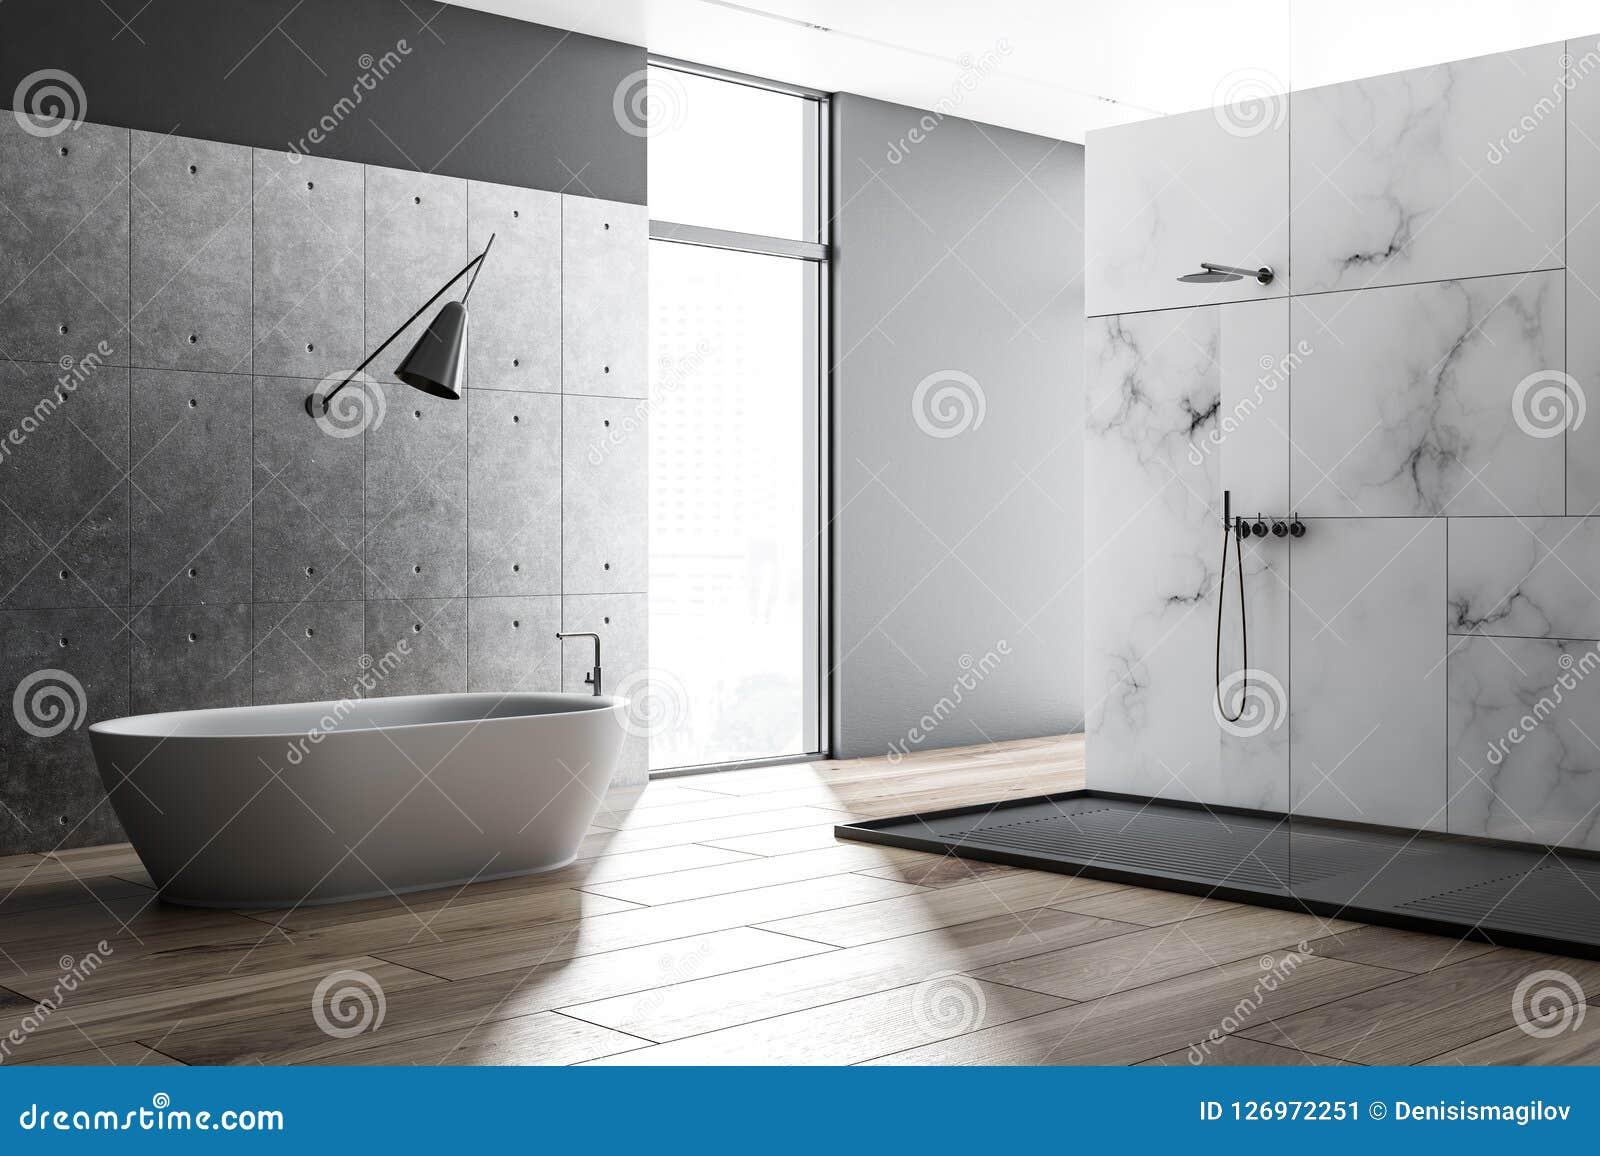 White Marble Loft Bathroom Interior Shower Stock Illustration Illustration Of Render Design 126972251